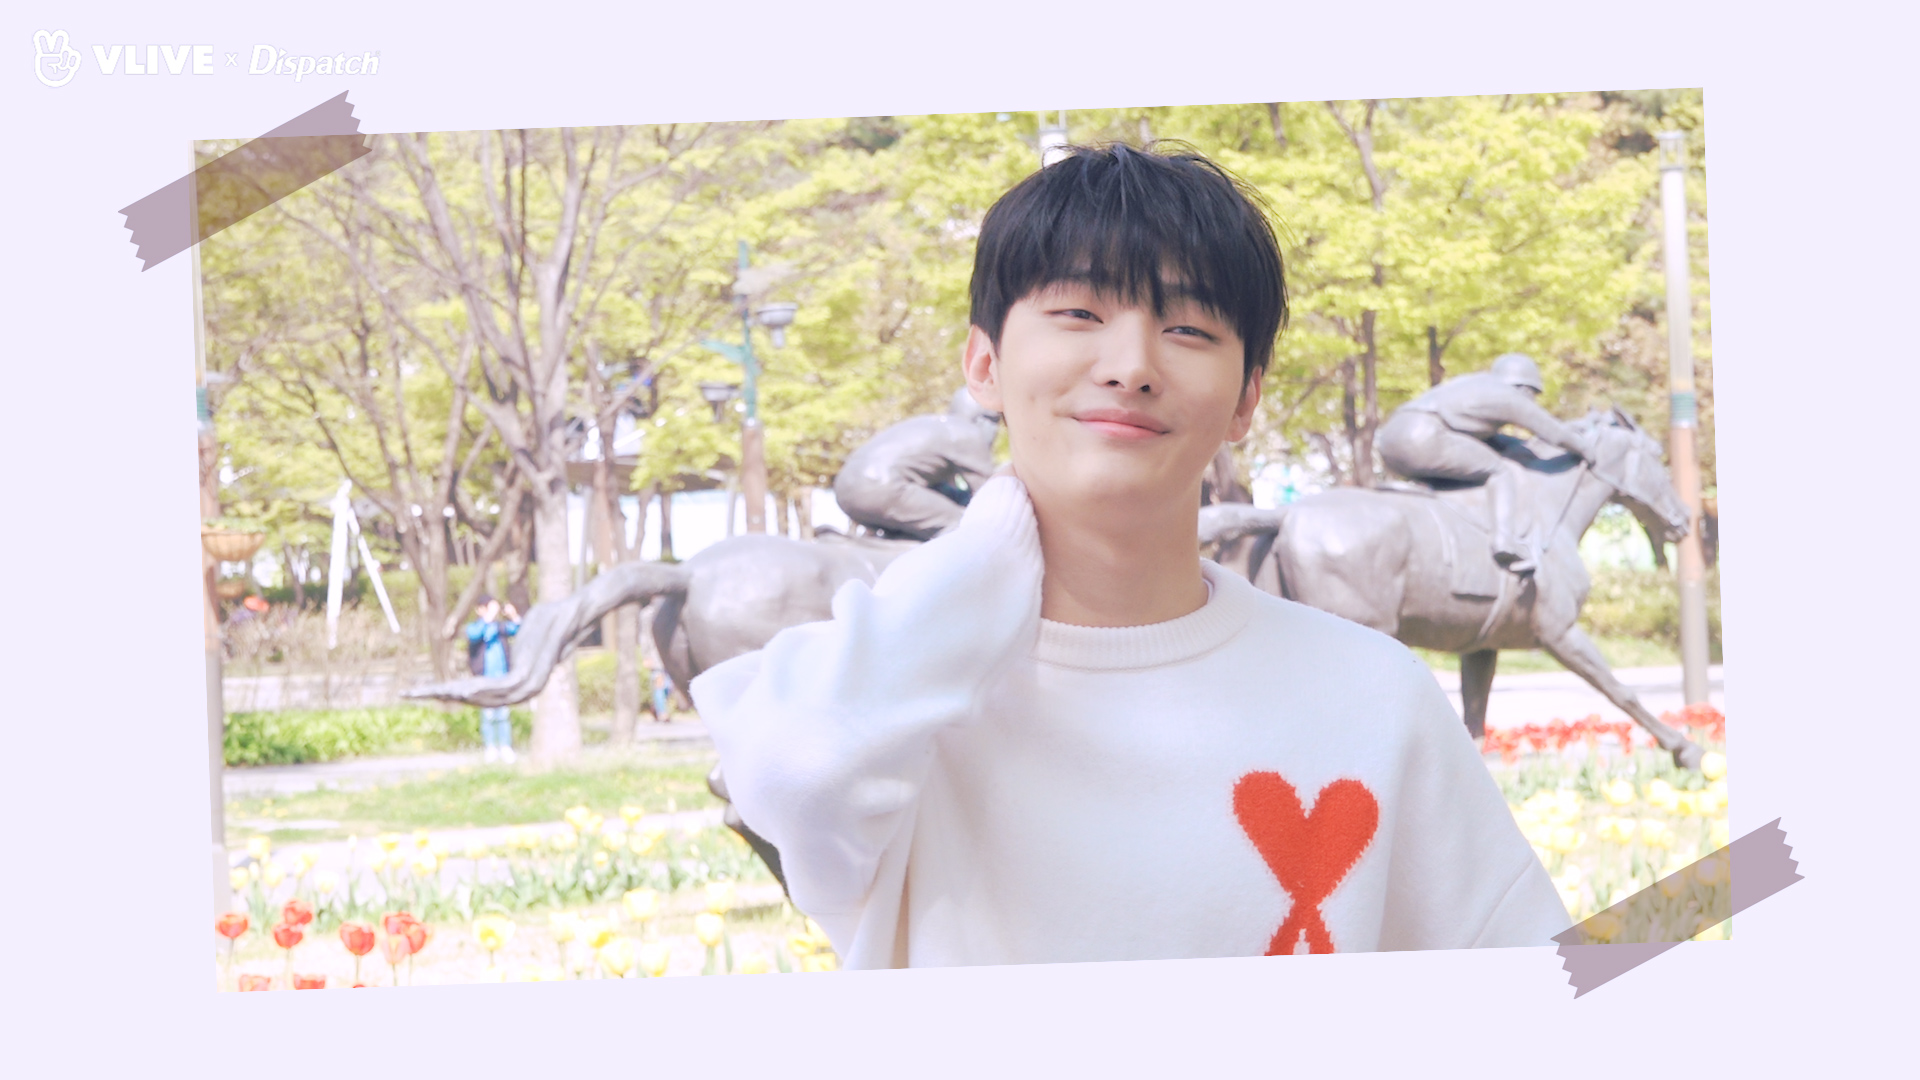 "[ⓓxV] ""지성의 페이지"" (윤지성:YOON JI SUNG)"